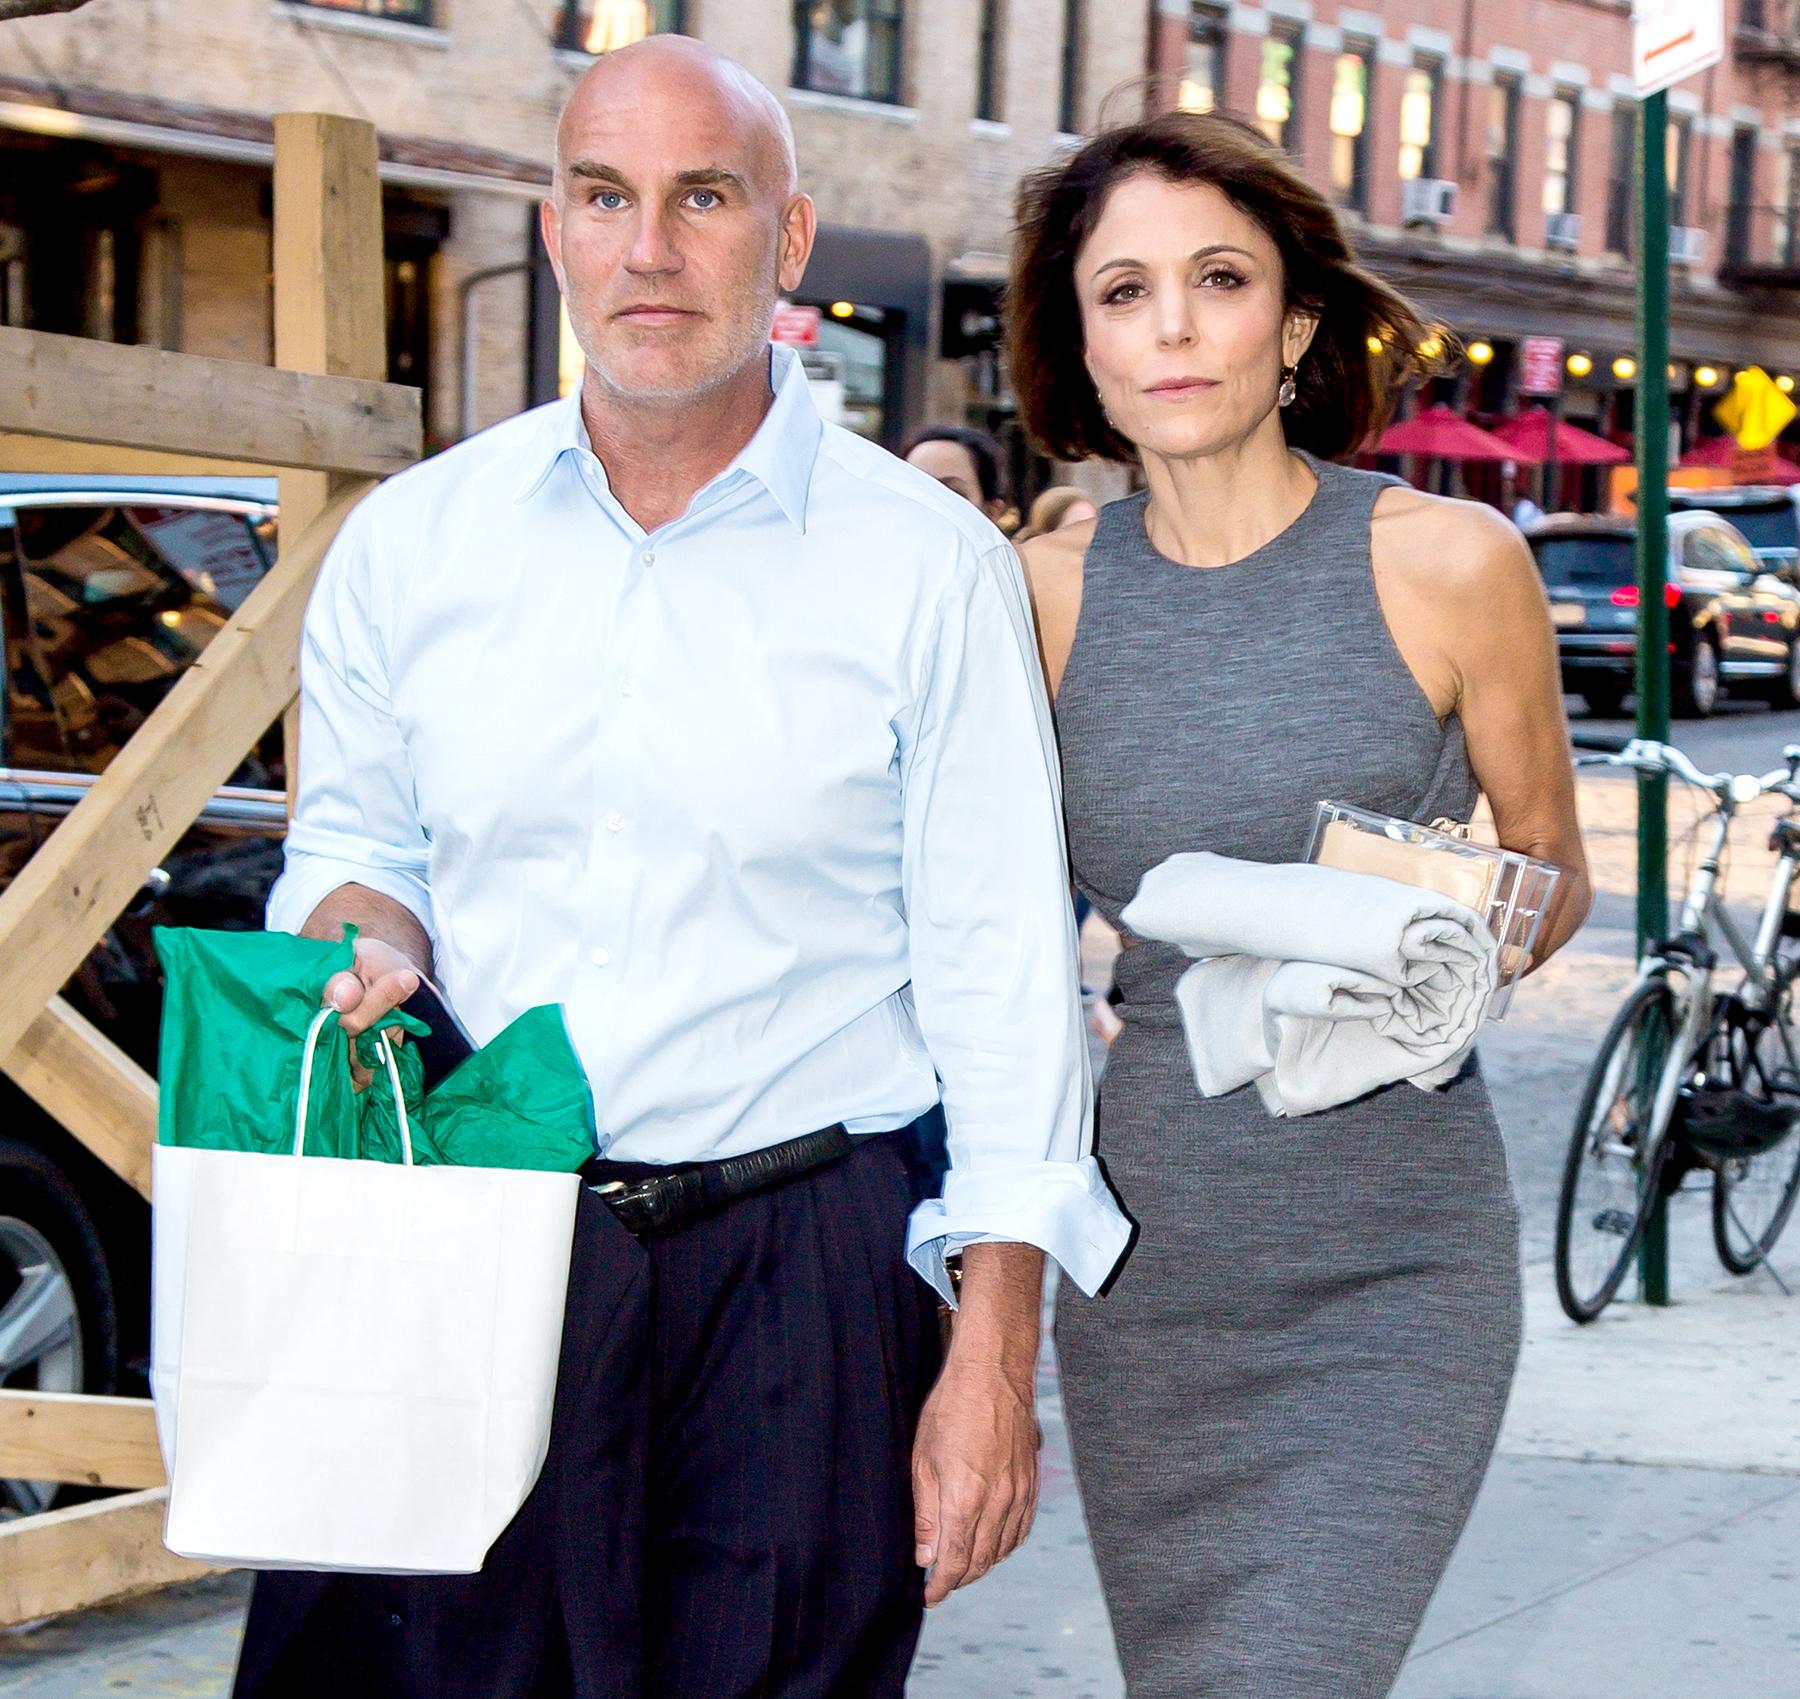 Bethenny-Frankel-remembers-Dennis-Shields - Dennis Shields and Bethenny Frankel are seen leaving SoHo House in New York City on June 14, 2016.